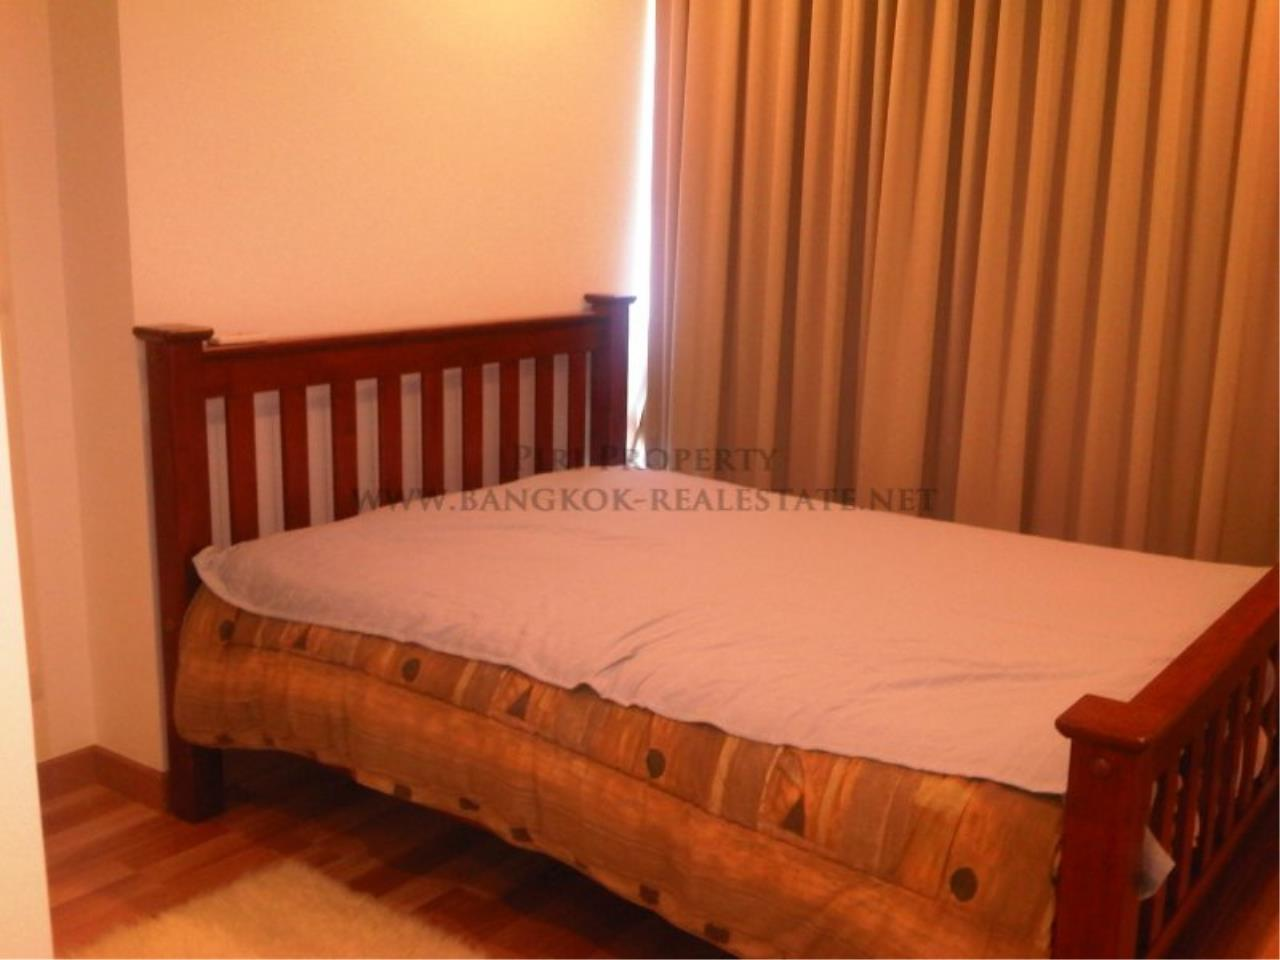 Piri Property Agency's 2 Bedroom - Modern and Brand New - IDEO Verve 4